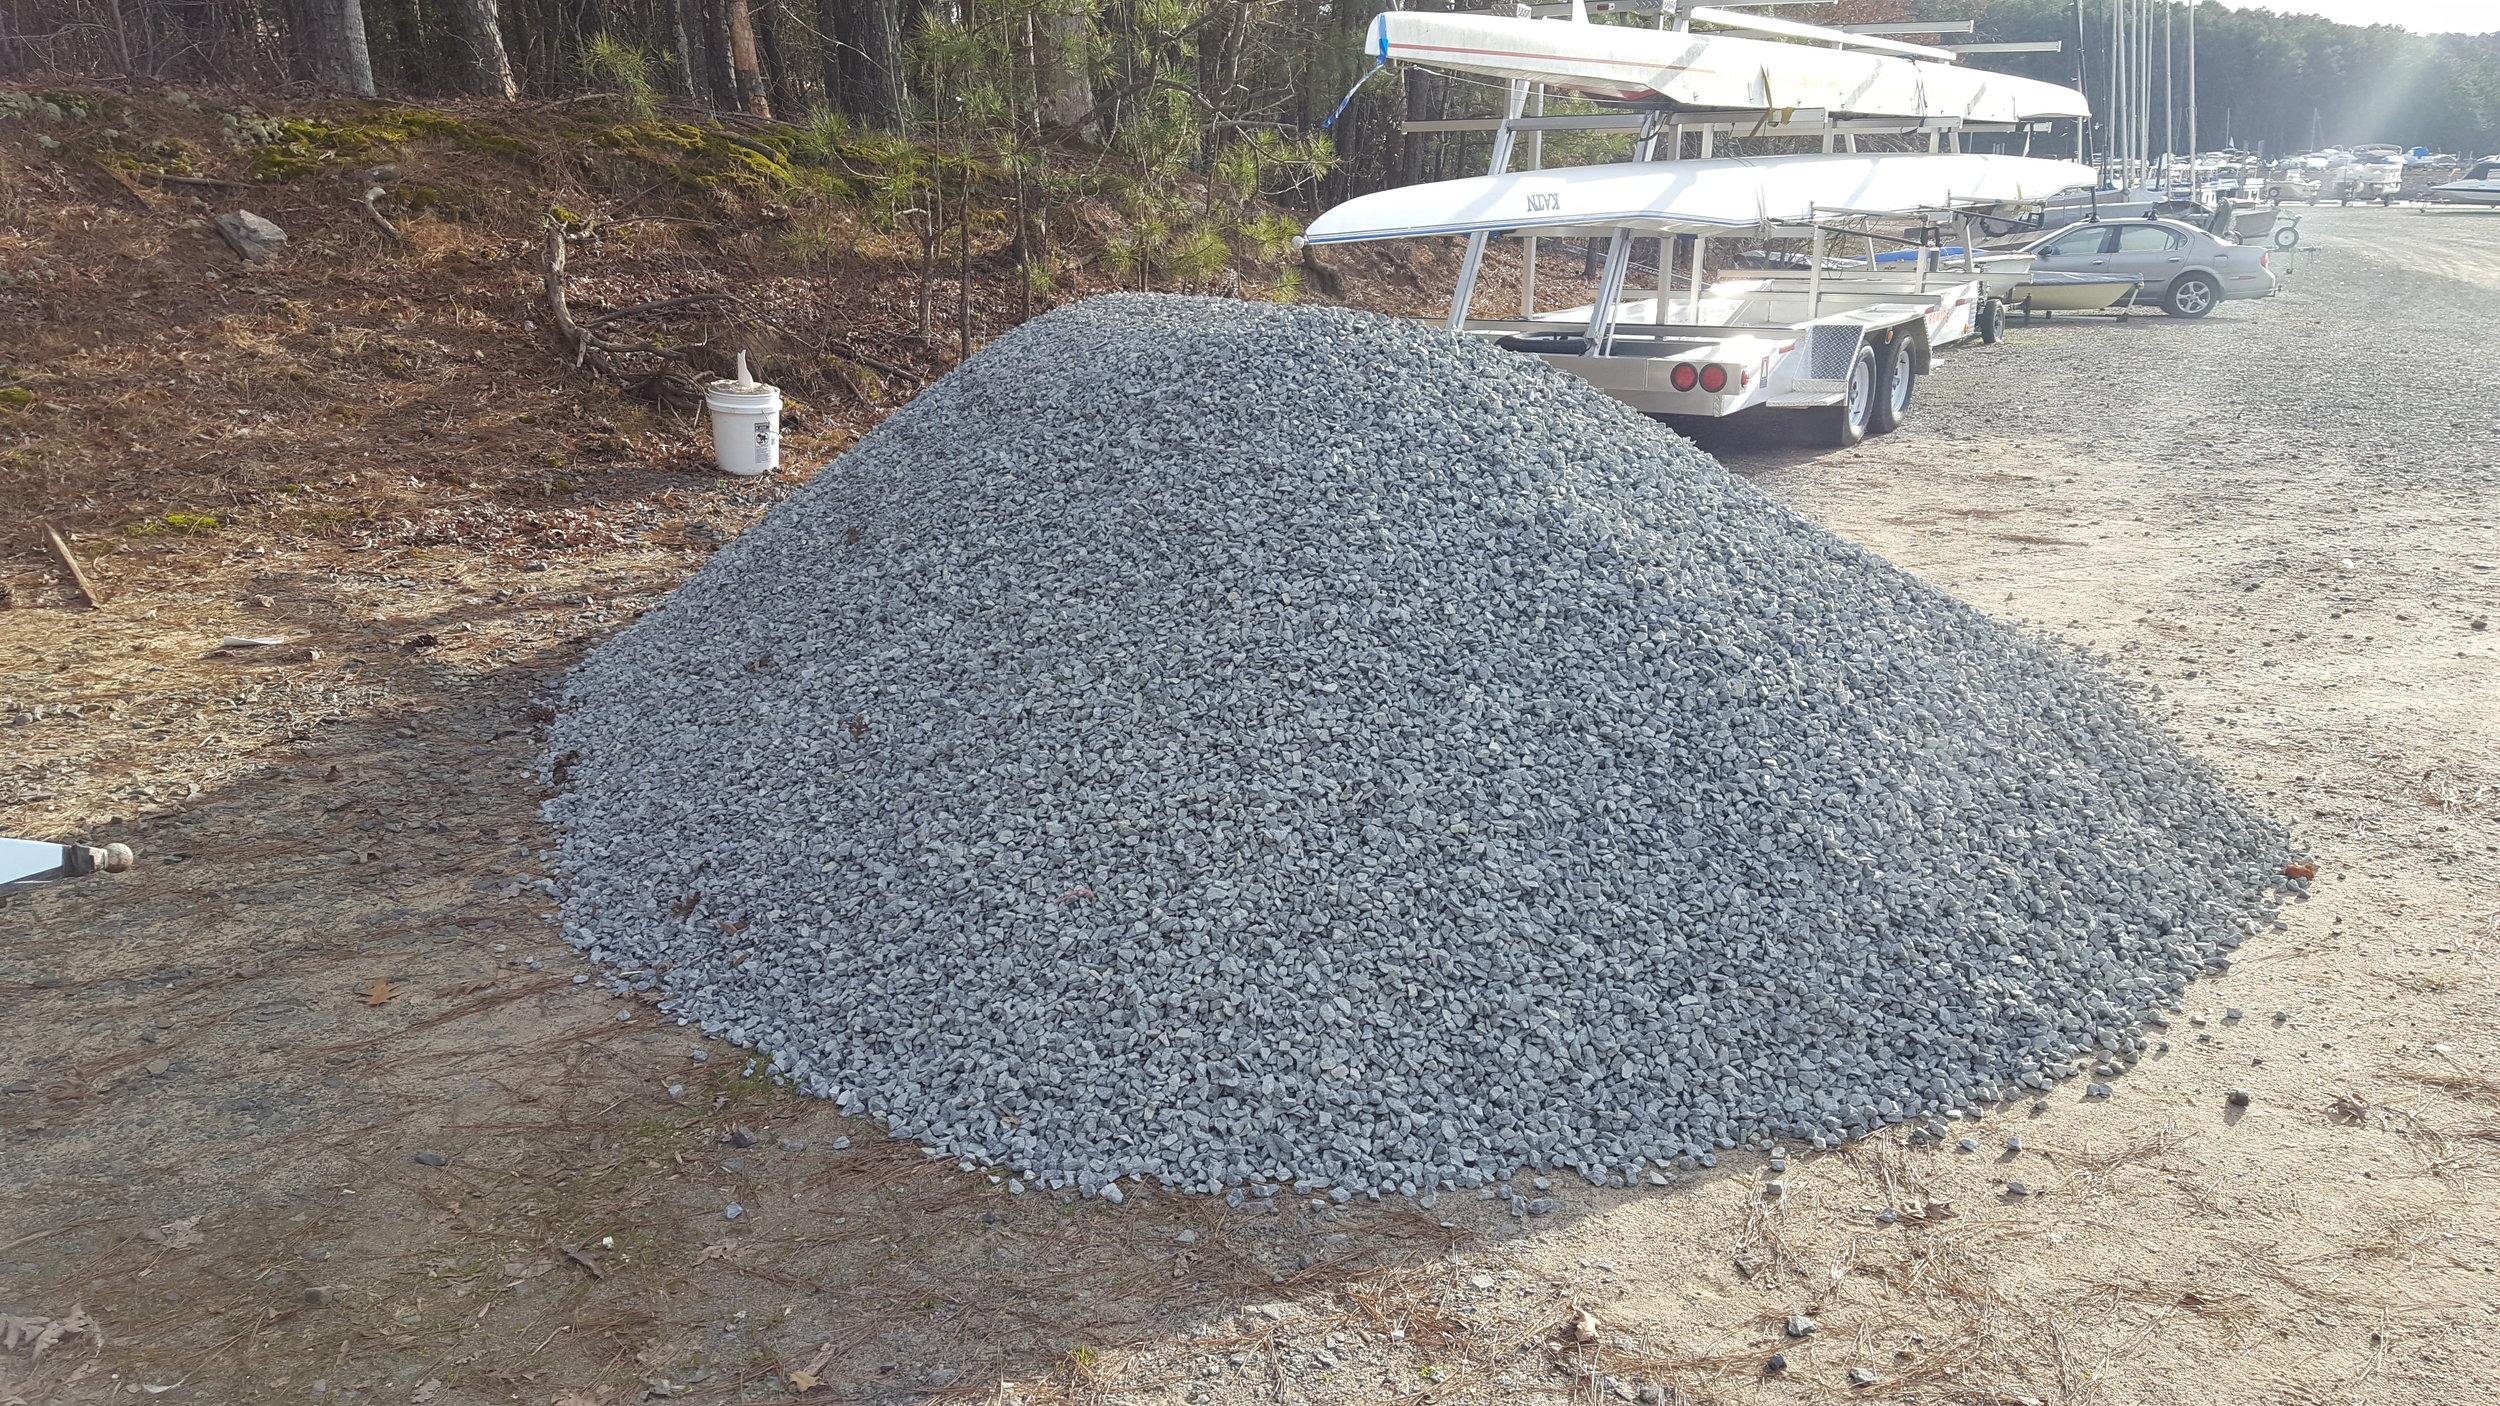 7.5 tons of gravel